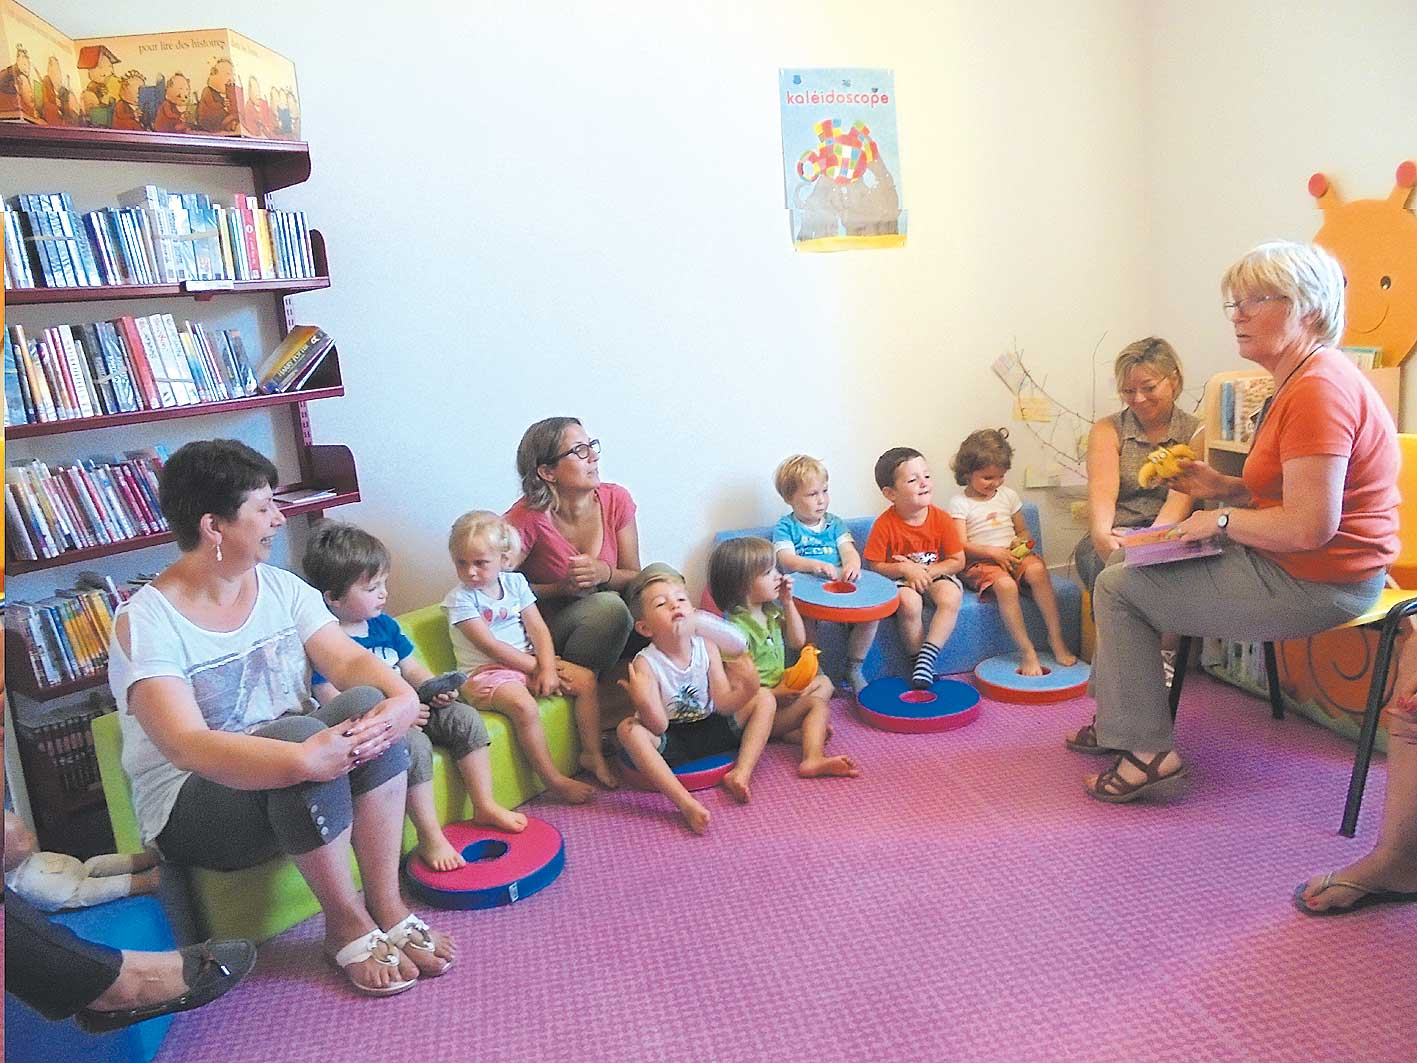 Bibliotheque Cotiere